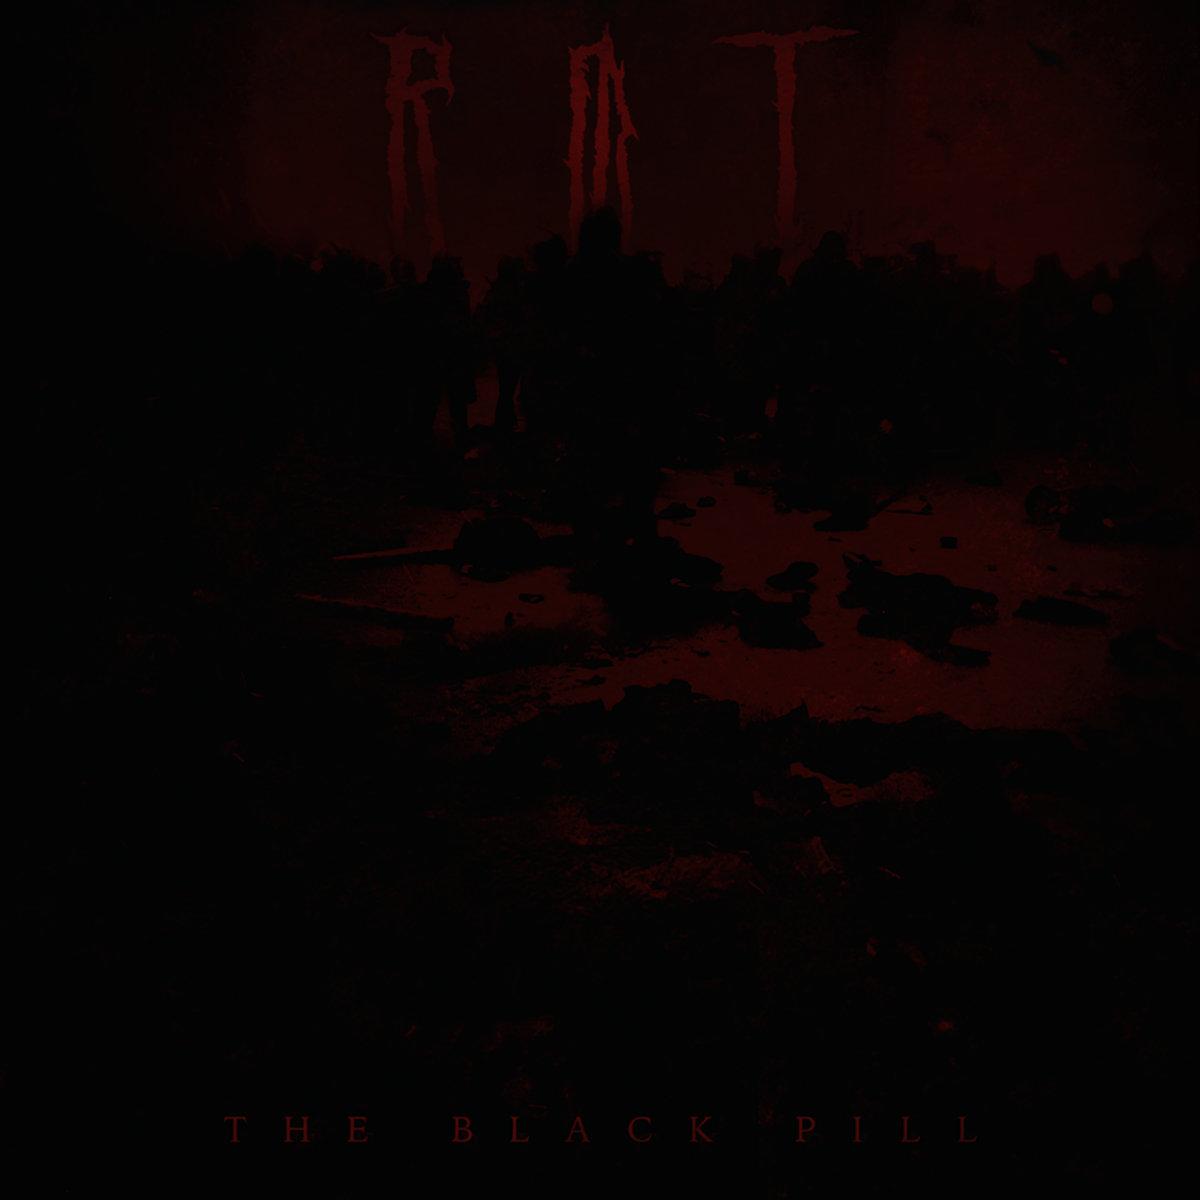 Røt - New Age Terrorism [single] (2020)